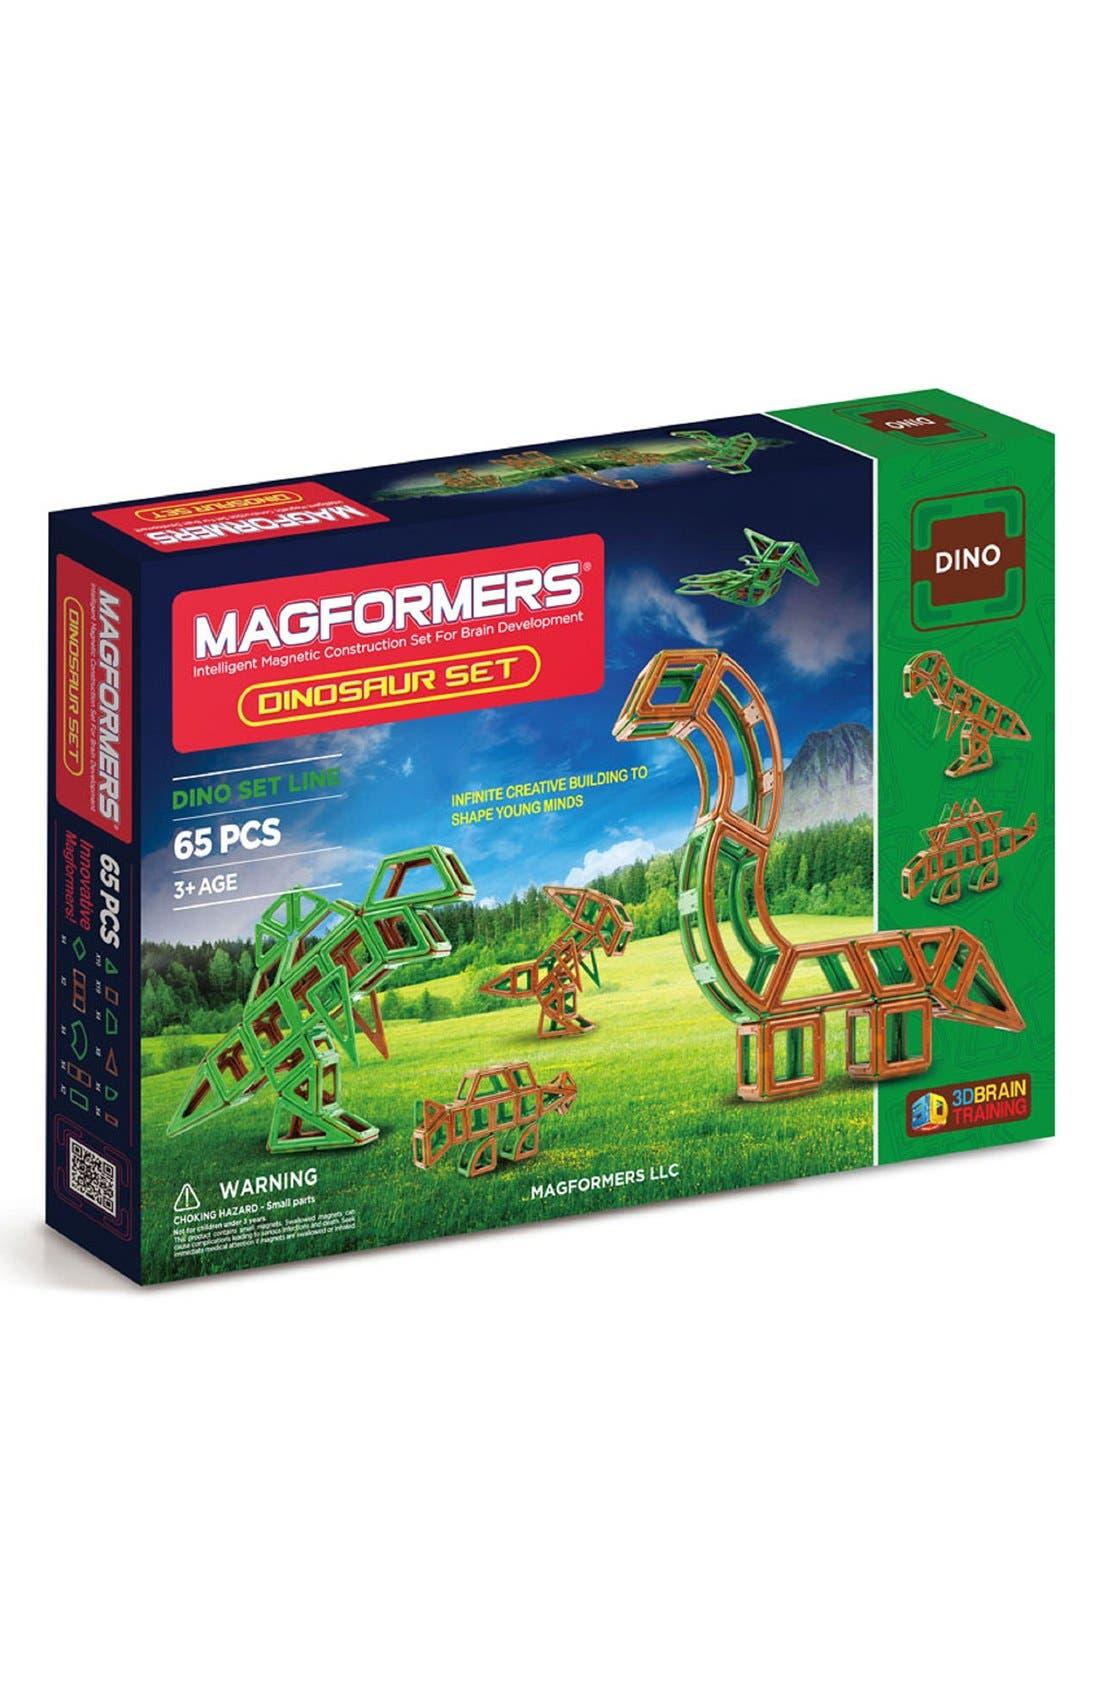 MAGFORMERS 'Dinosaur' Magnetic Construction Set